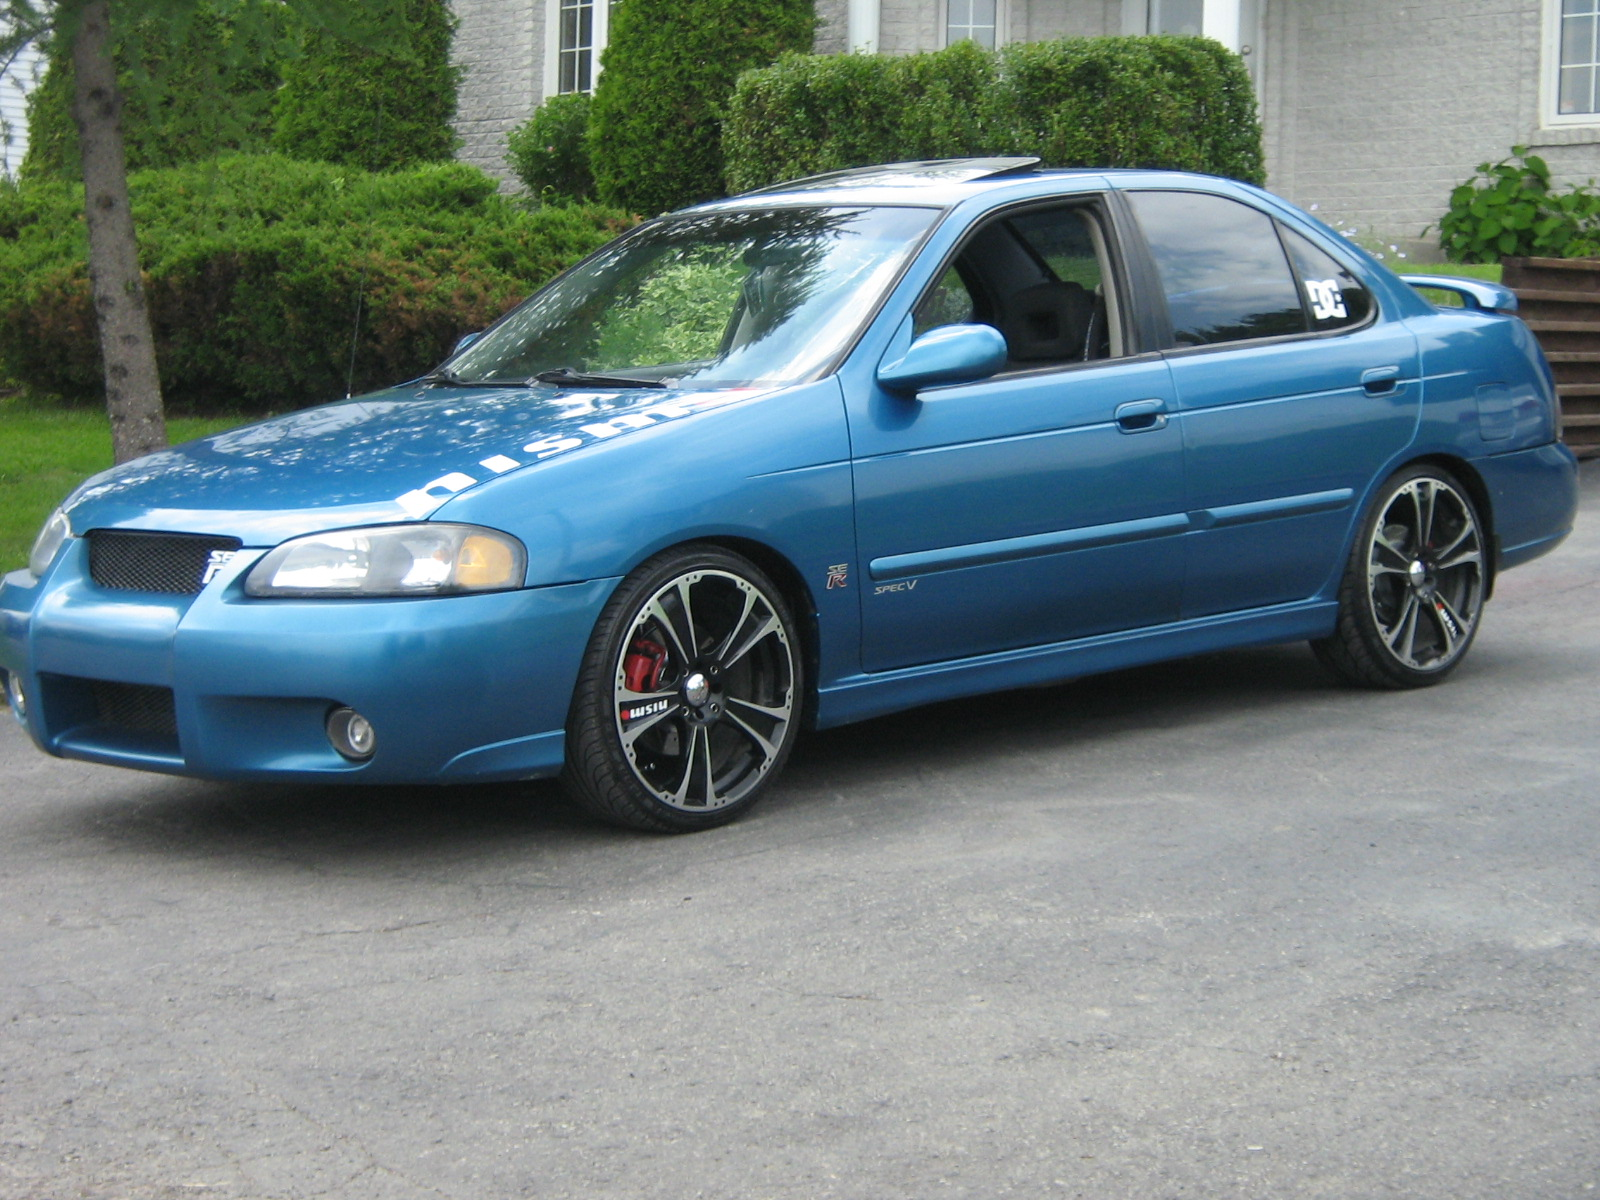 2003 Nissan Sentra Image 29